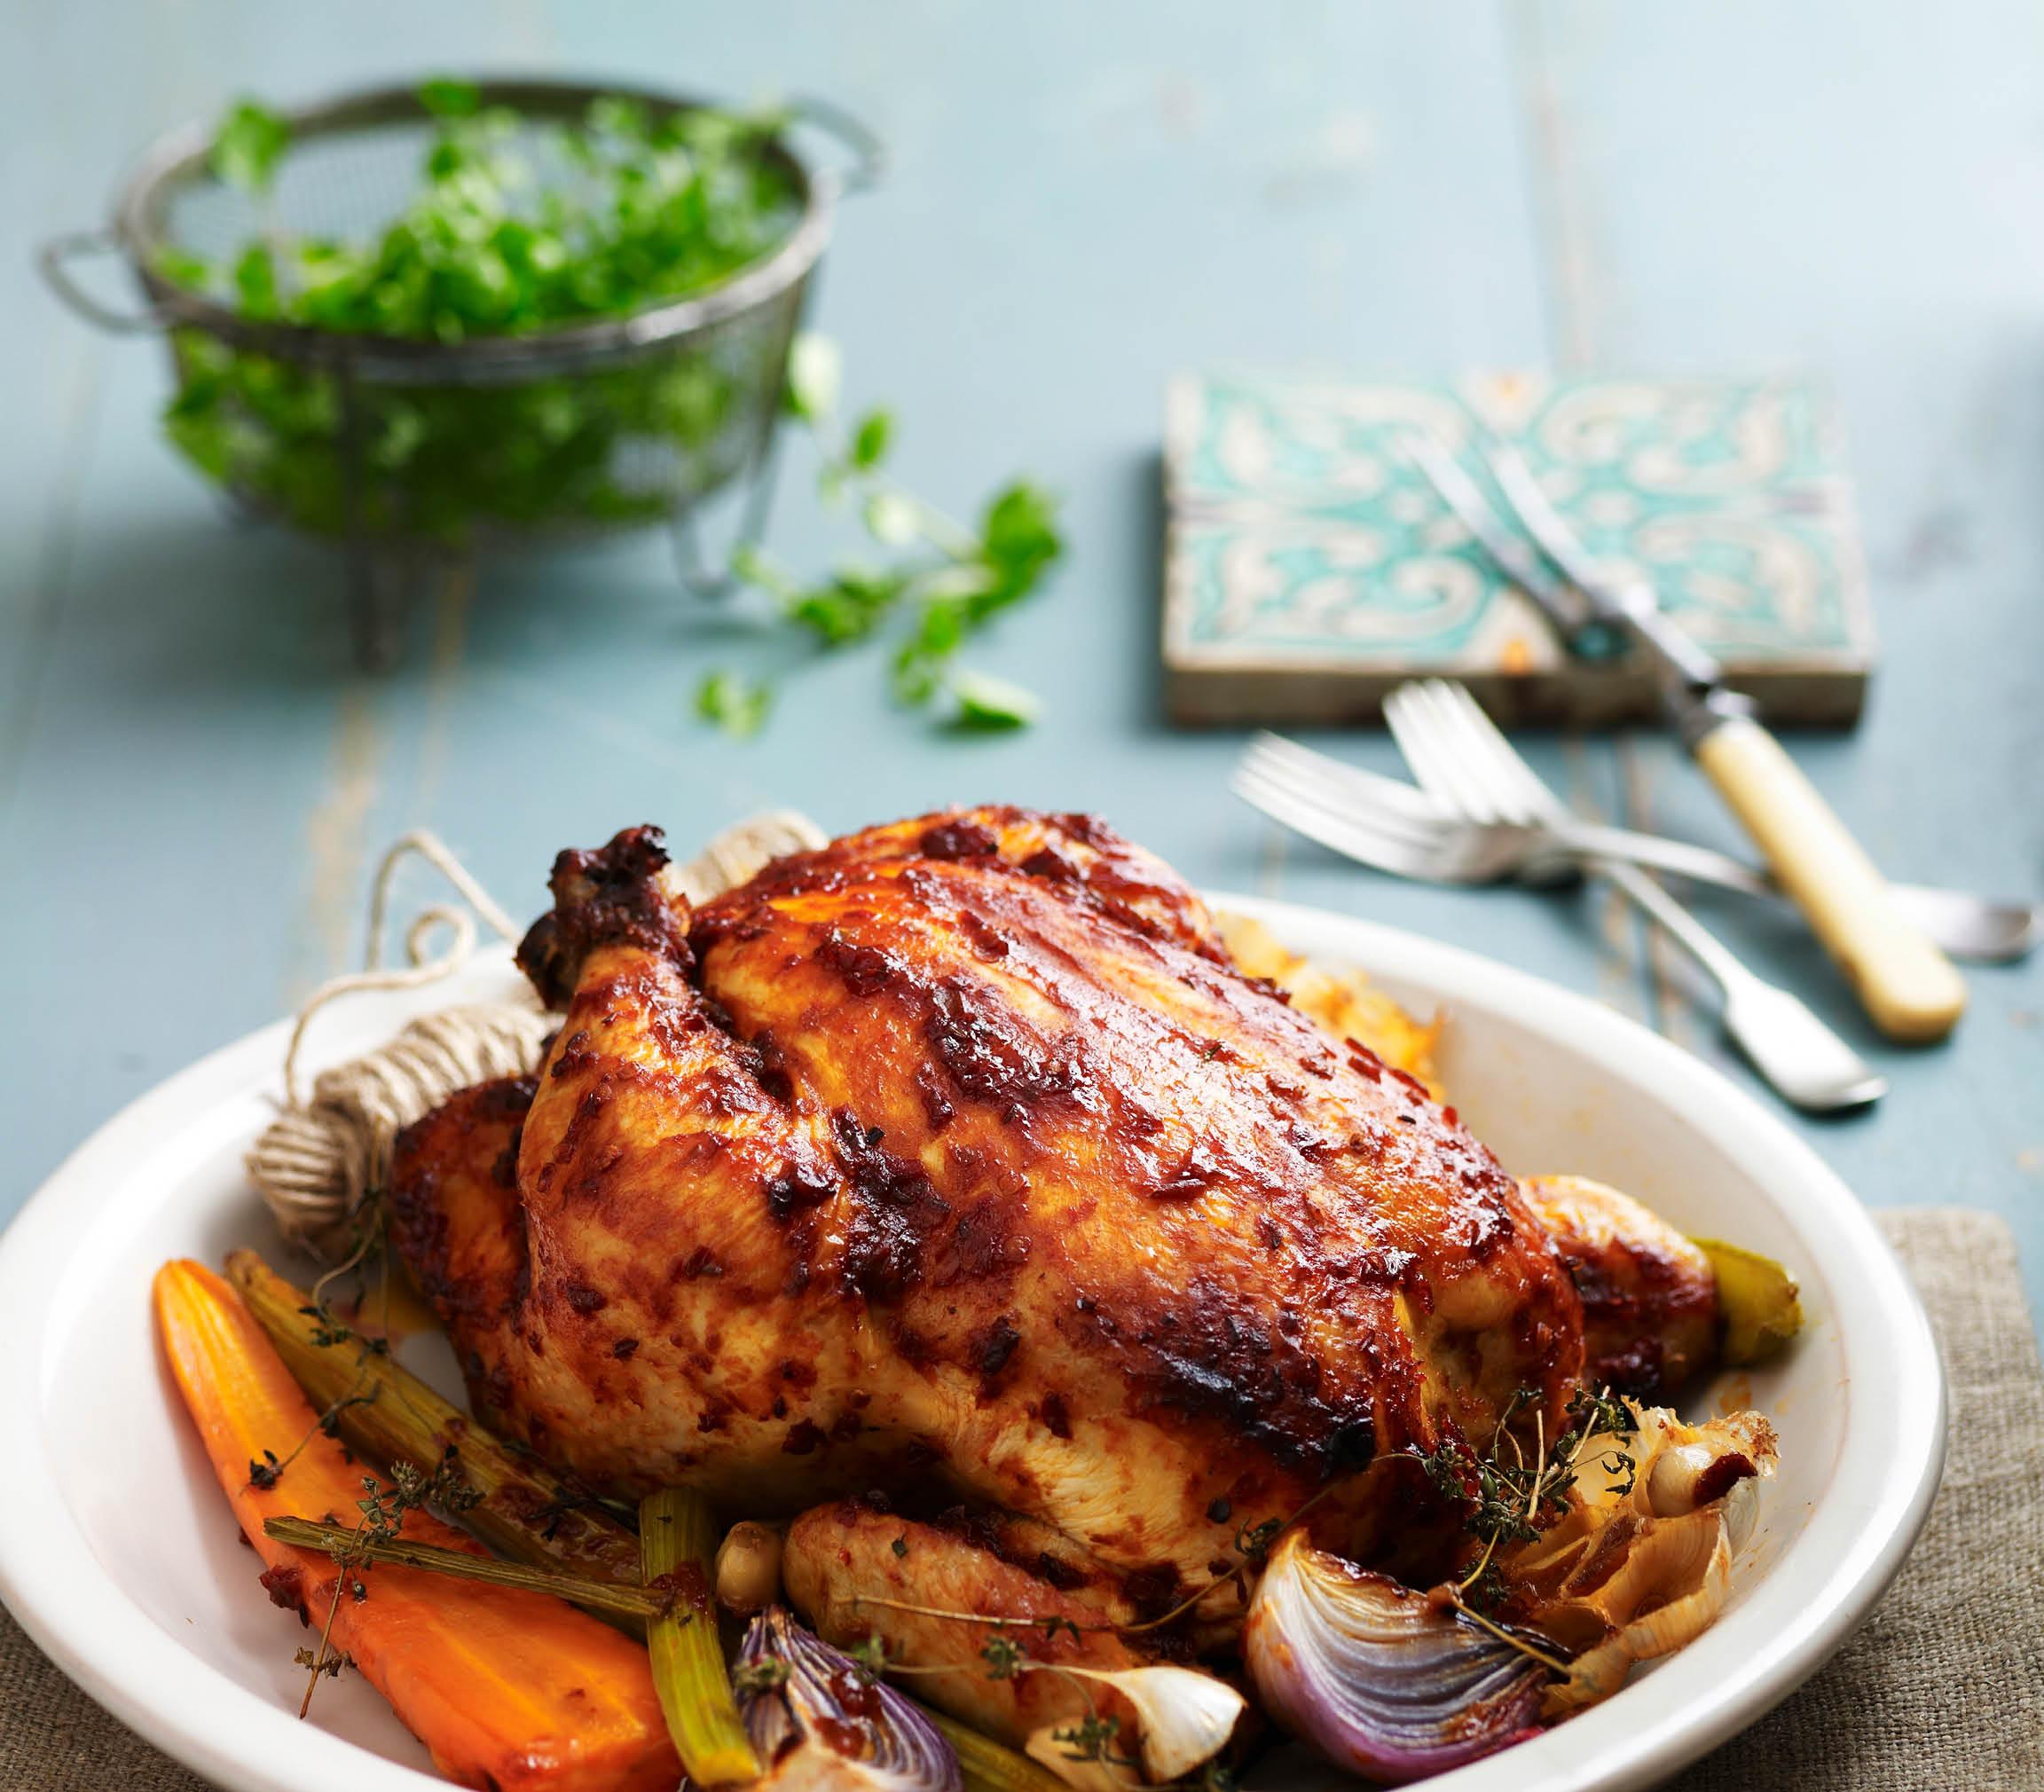 CH4801_Charter Hall_National_Recipes Winter 2019_Social Tiles_Harissa Chicken_Facebook Post_FA